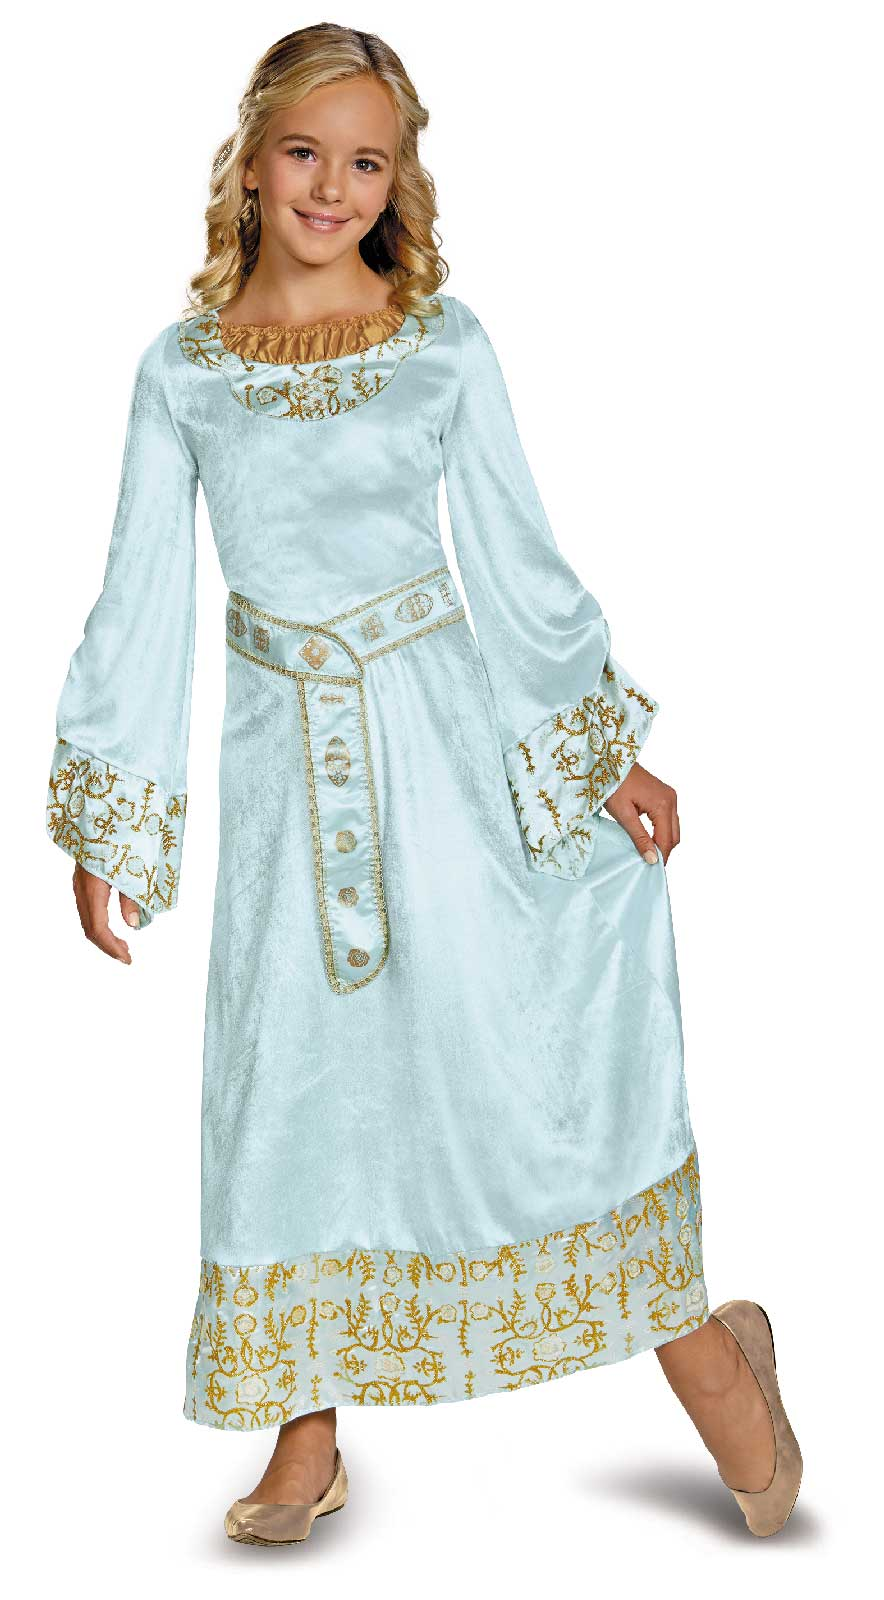 Princess Aurora Dress Up Costume - Meningrey